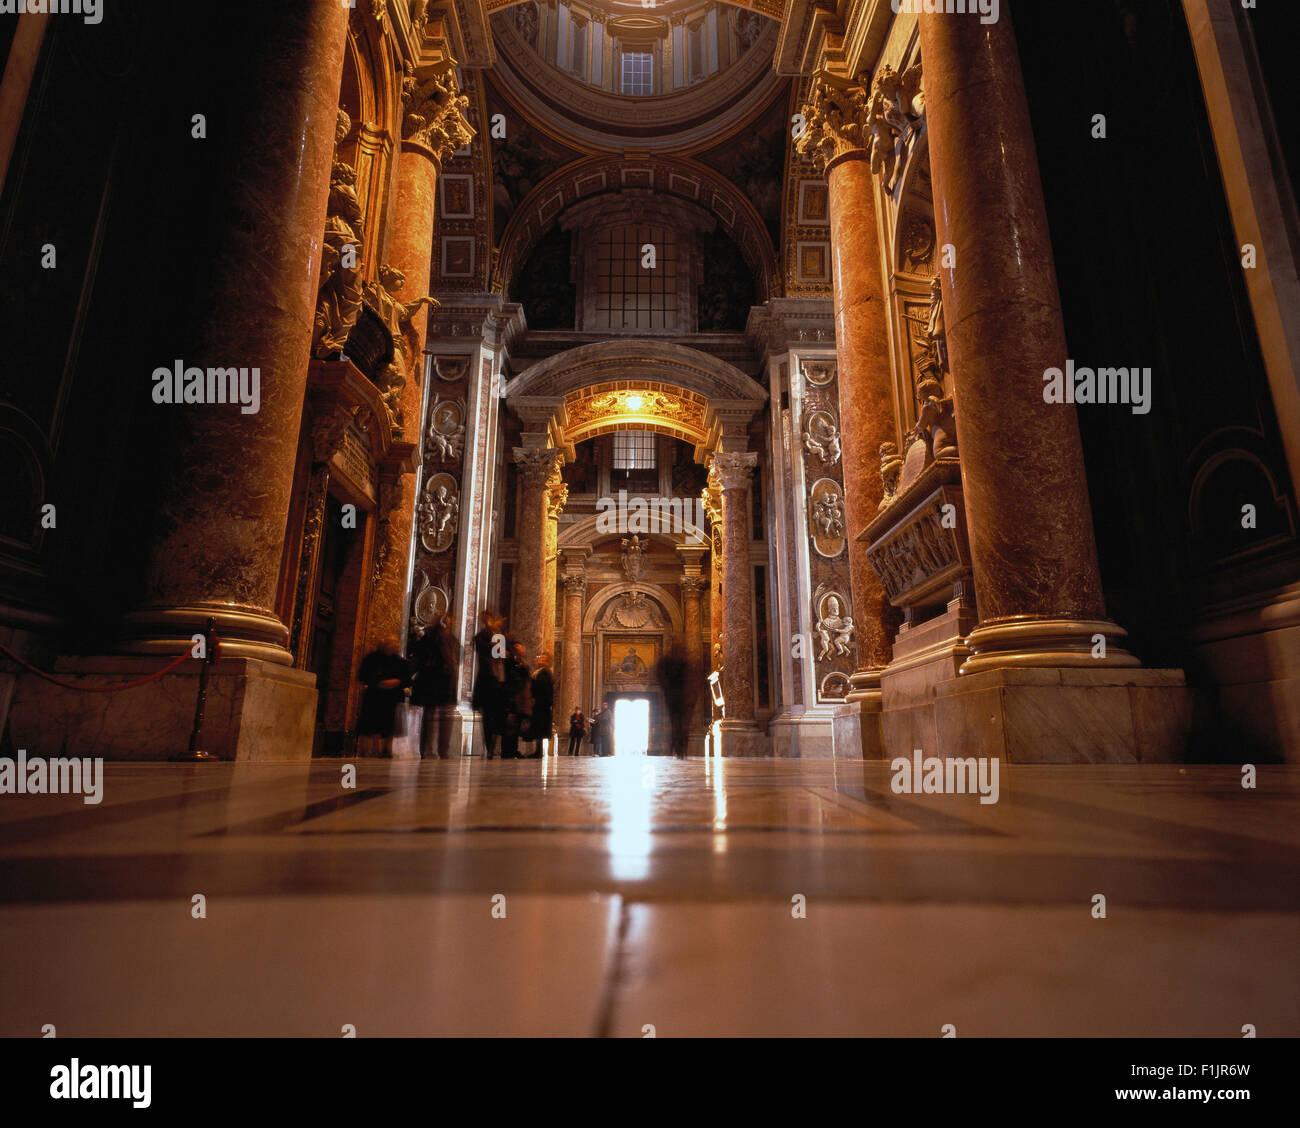 Interior St. Peter's Basilica Vatican City, Rome, Italy - Stock Image